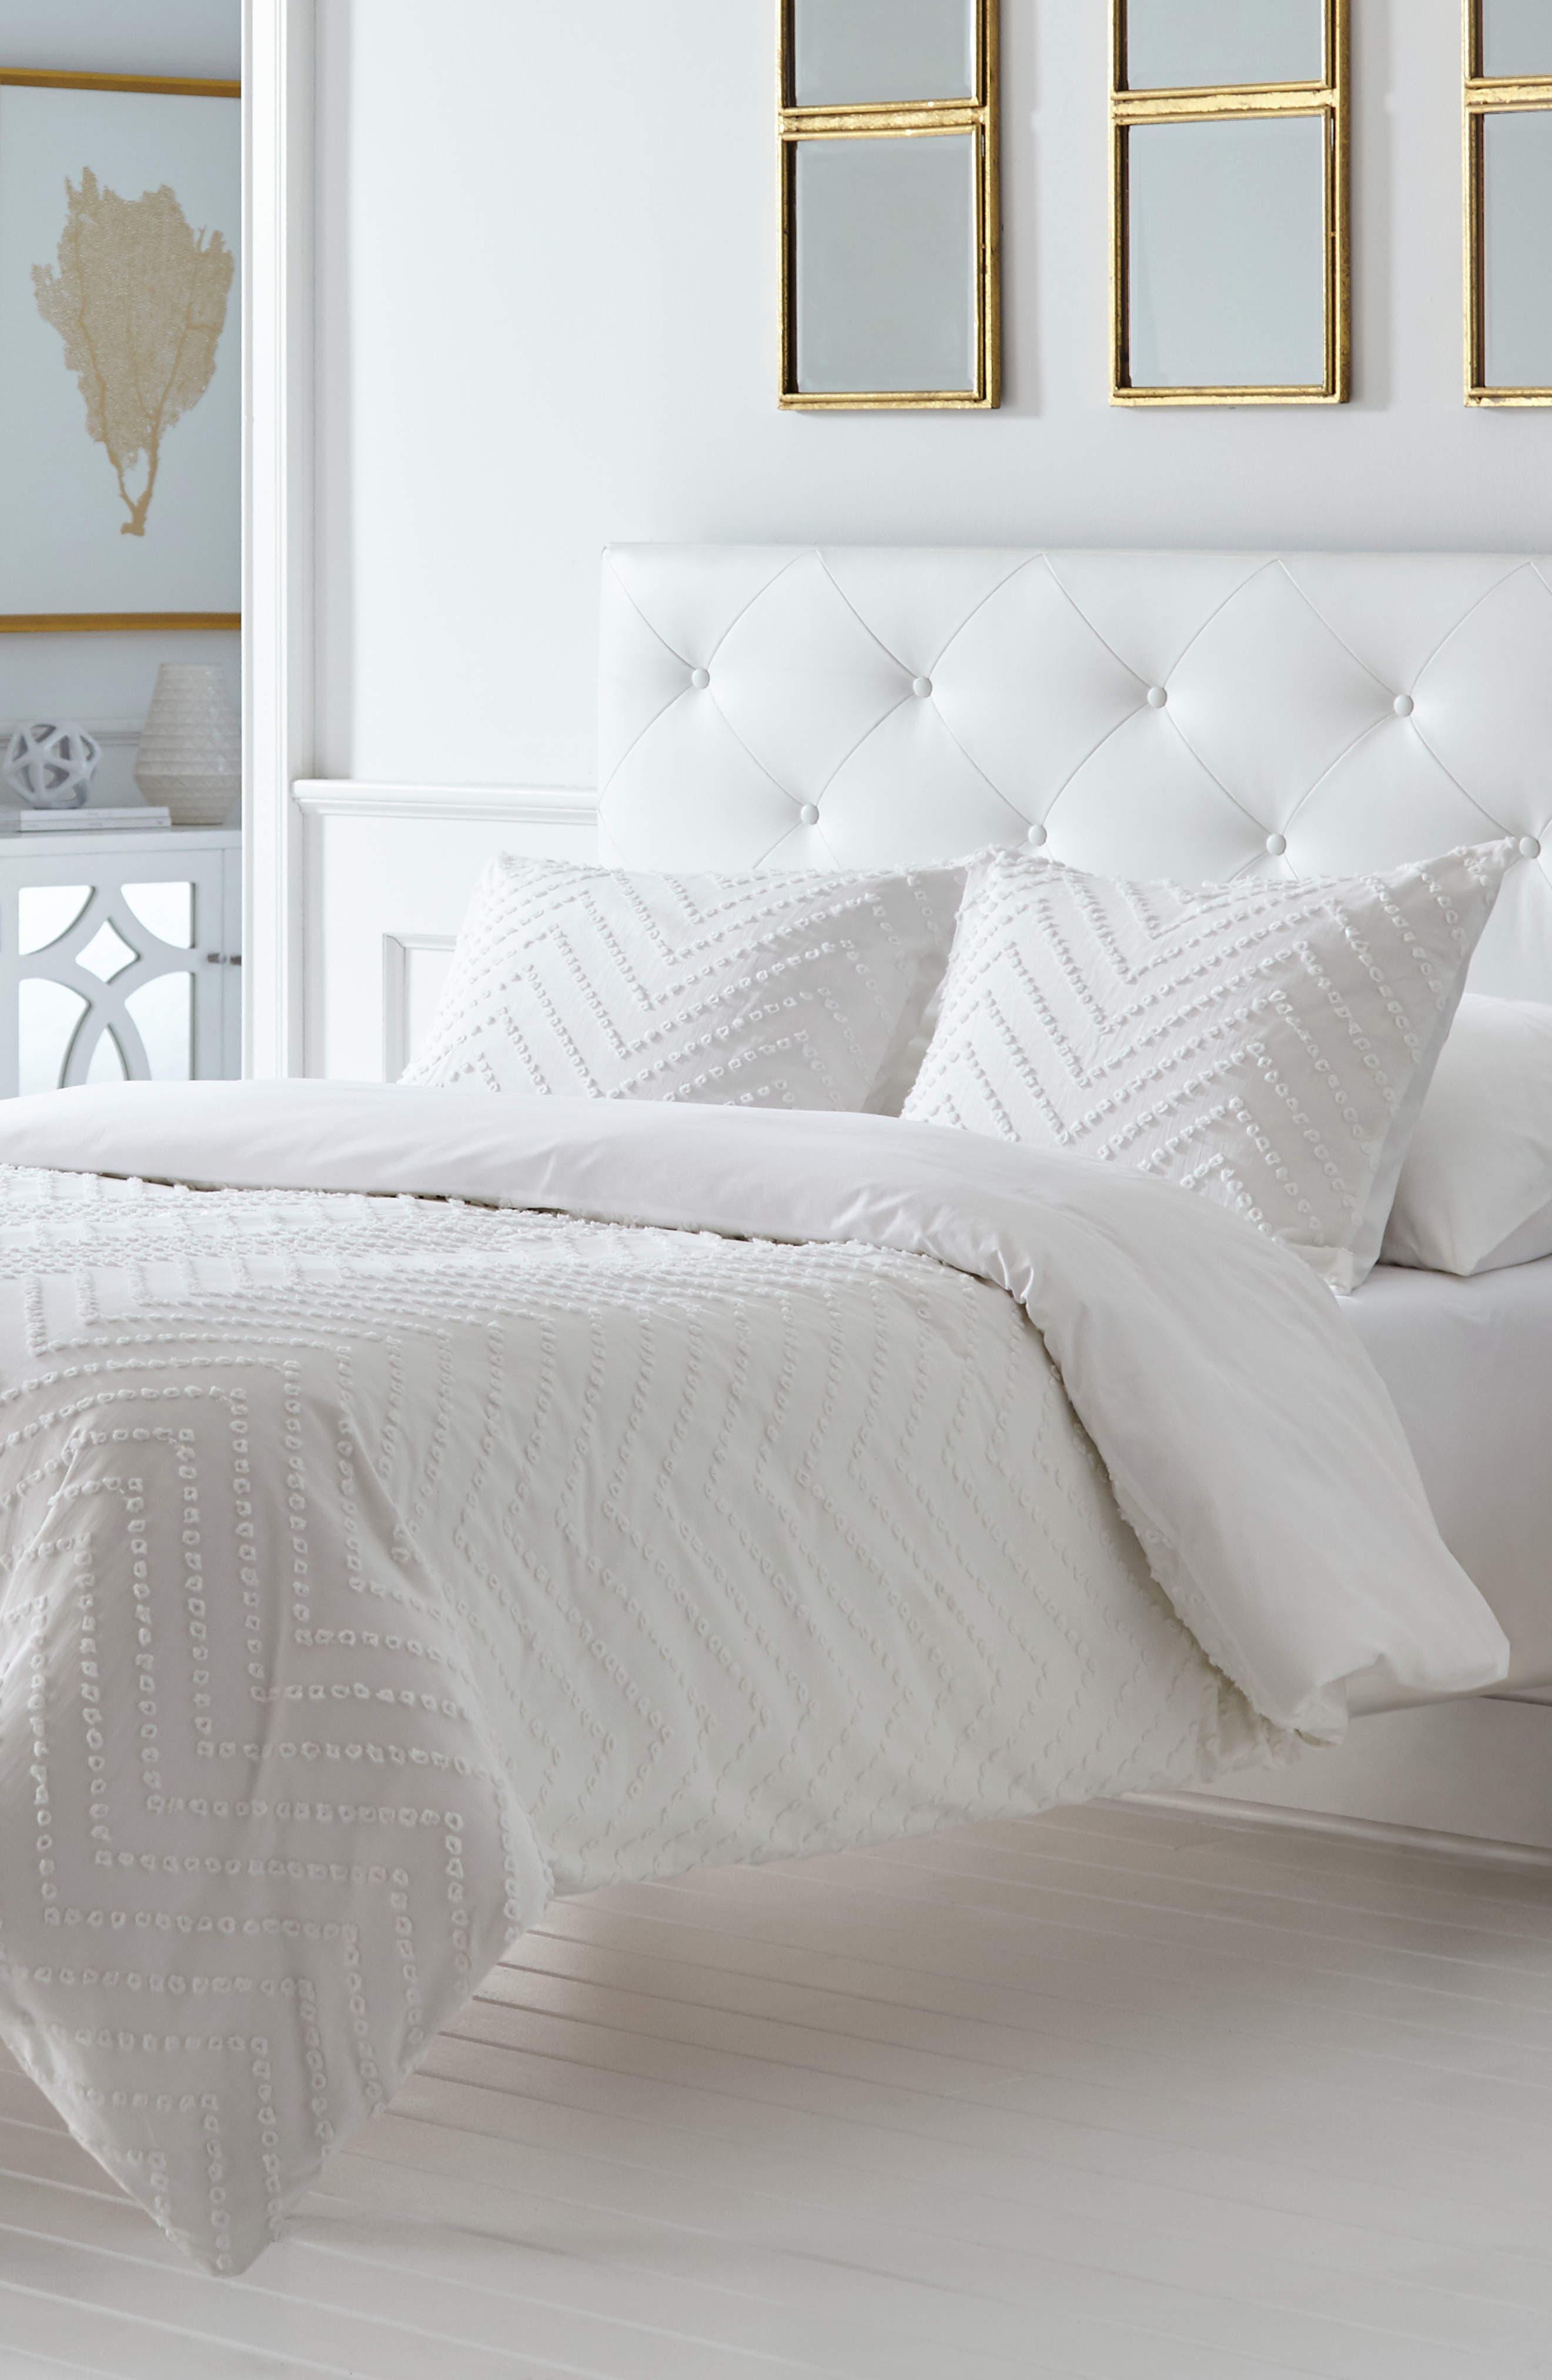 TRINA TURK Freya Comforter & Sham Set, Main, color, 100